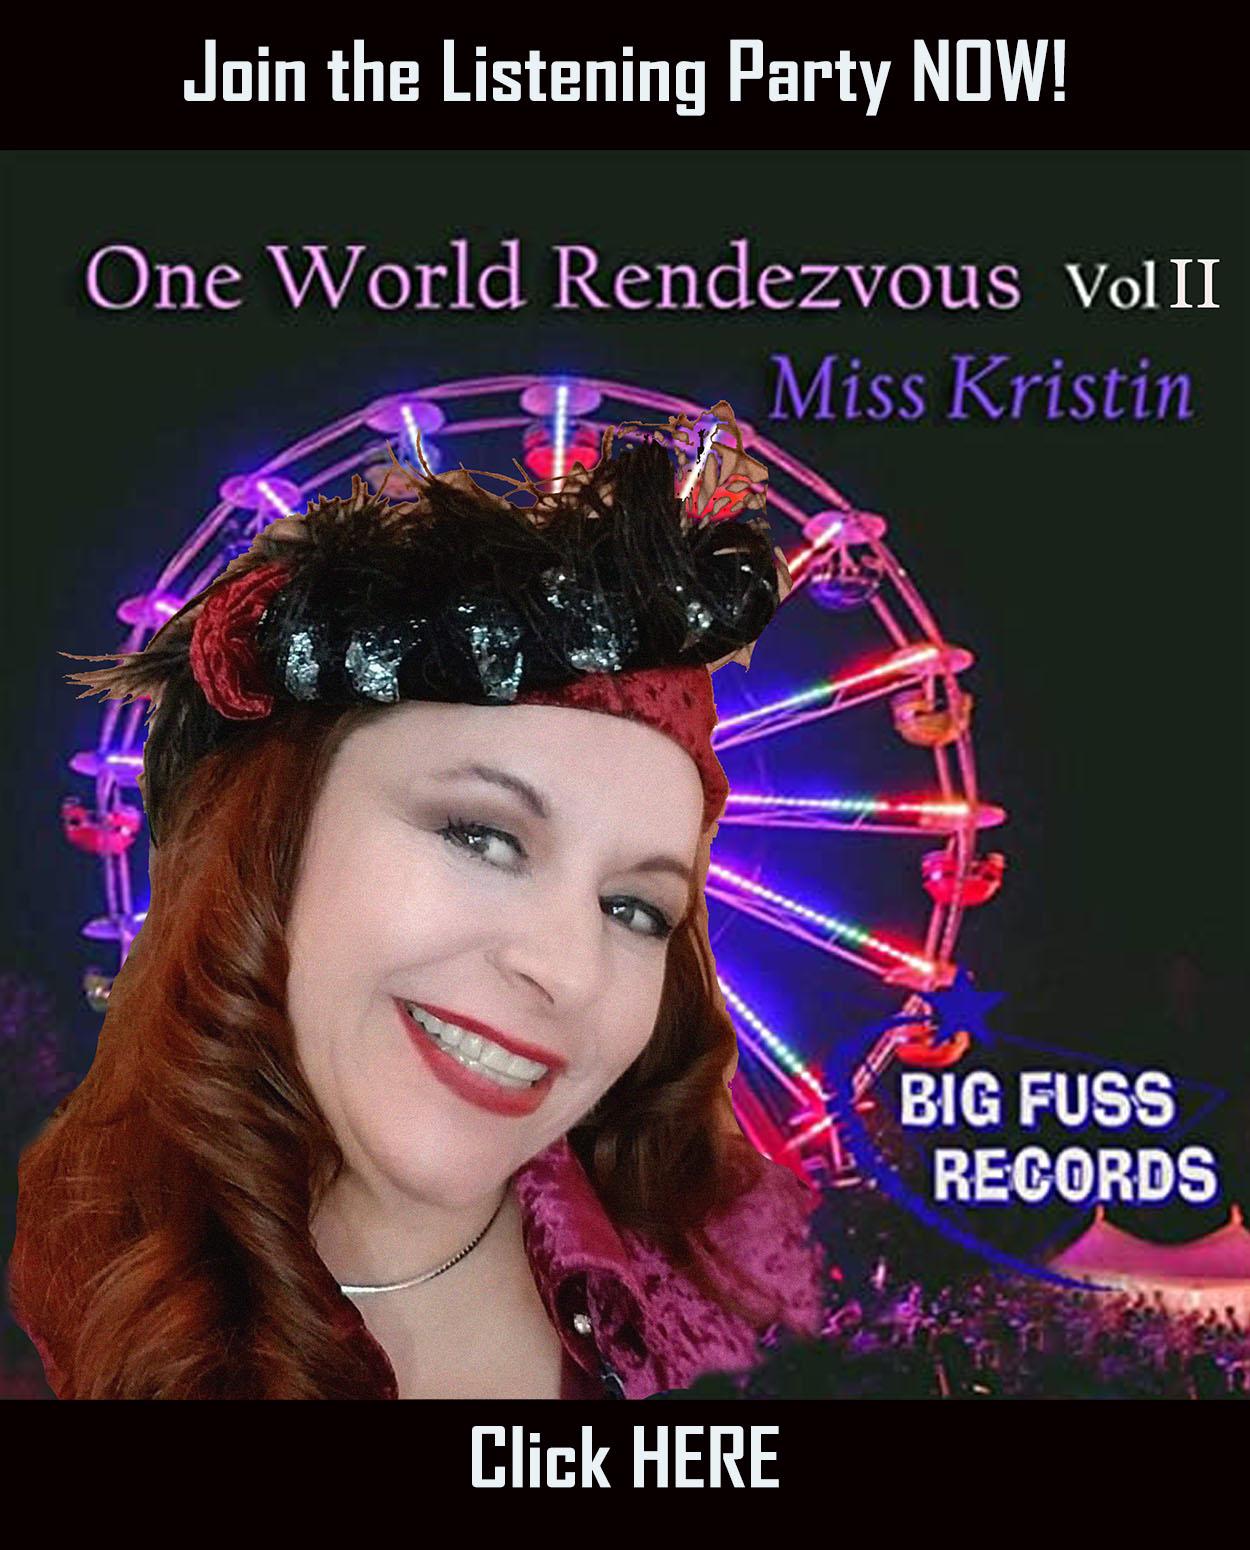 Miss Kristin, Listening Party